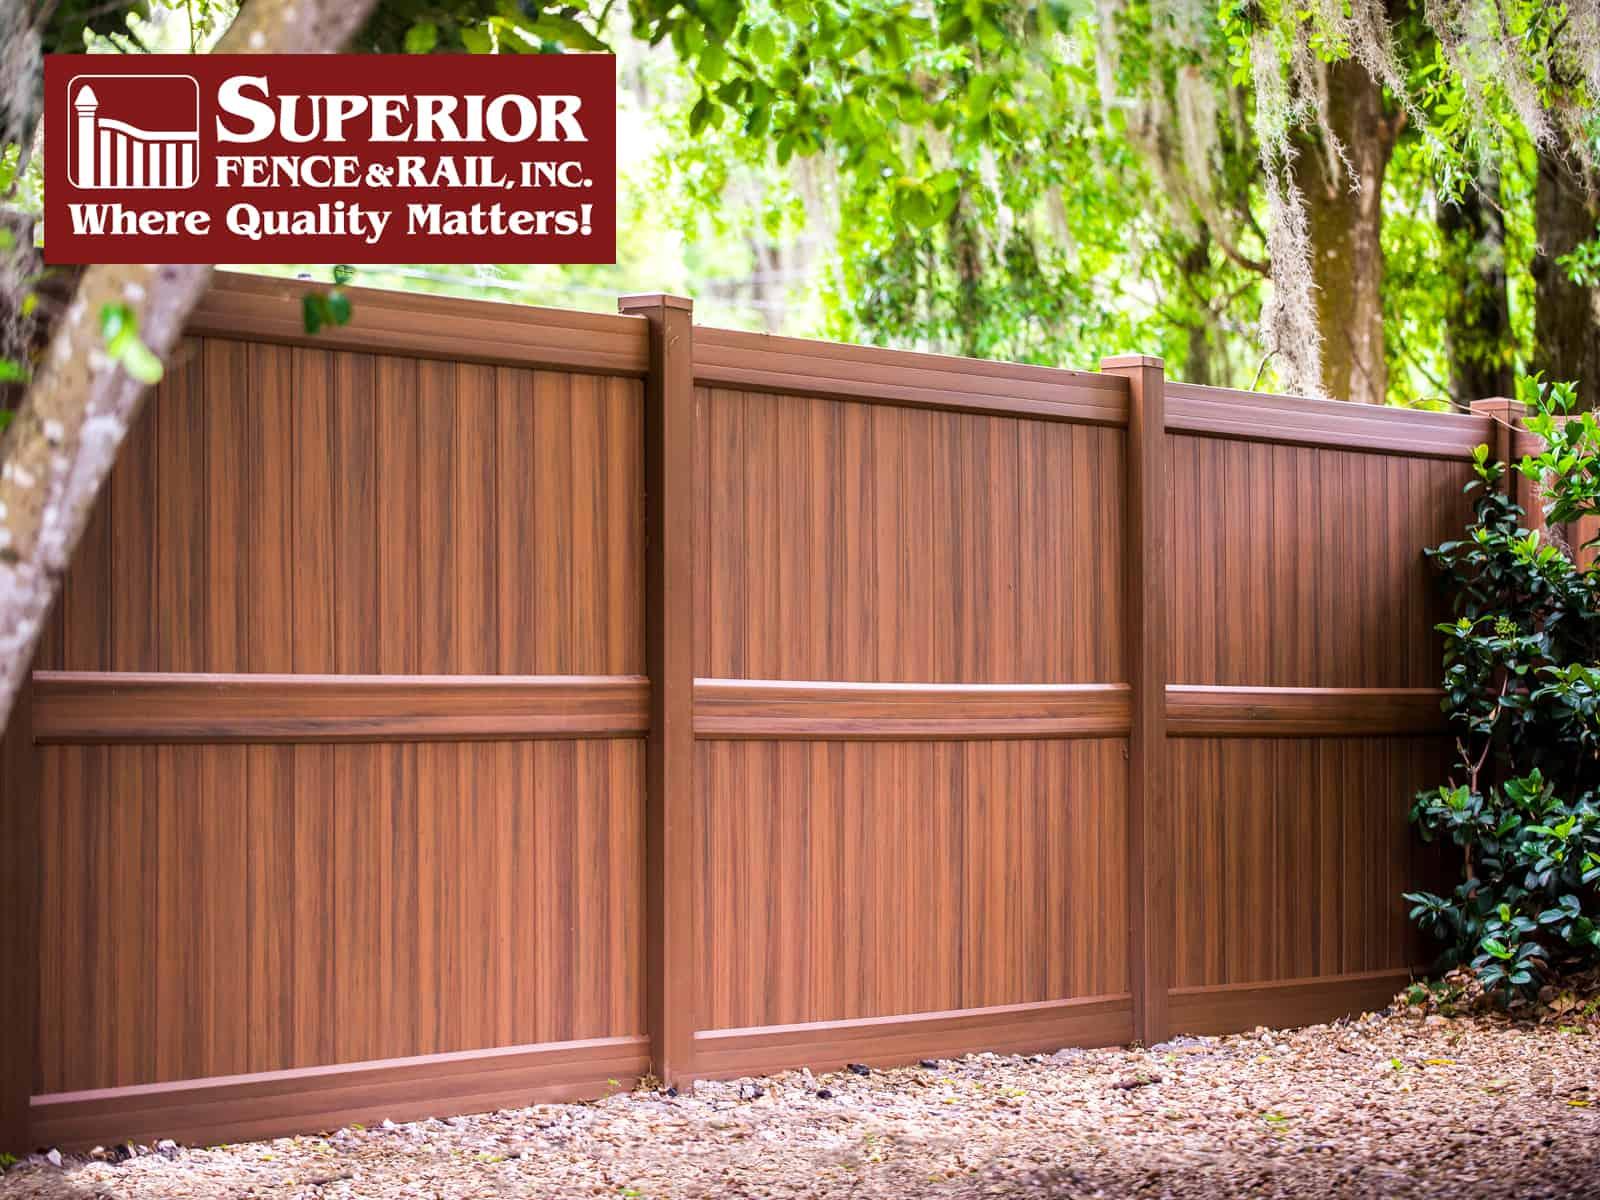 Jefferson fence company contractor